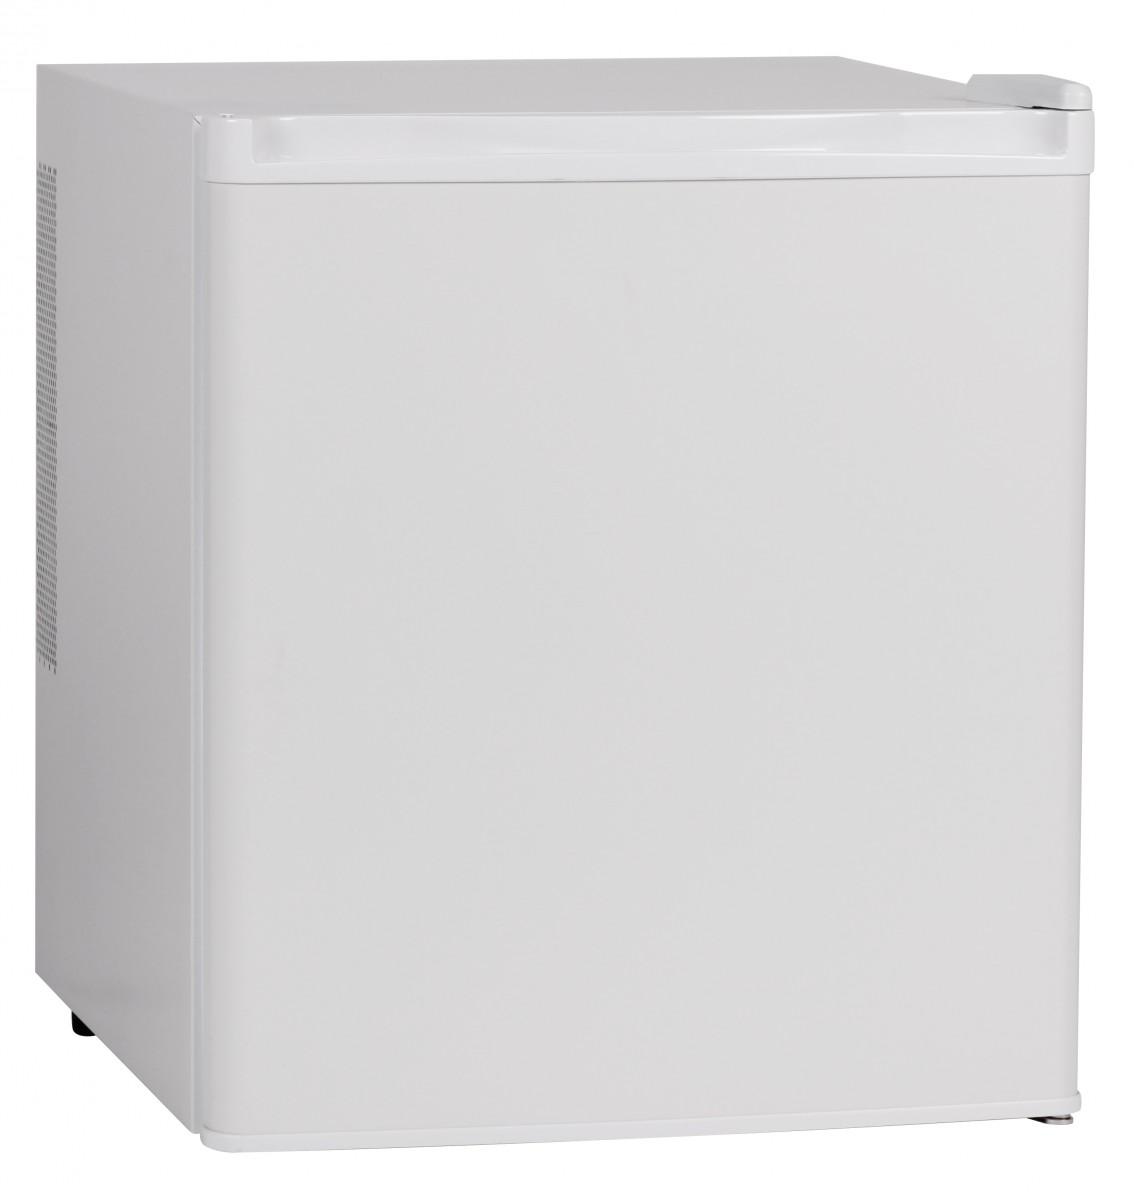 Amstyle Mini Bar Drink Cooler Fridge Refrigerator 46l